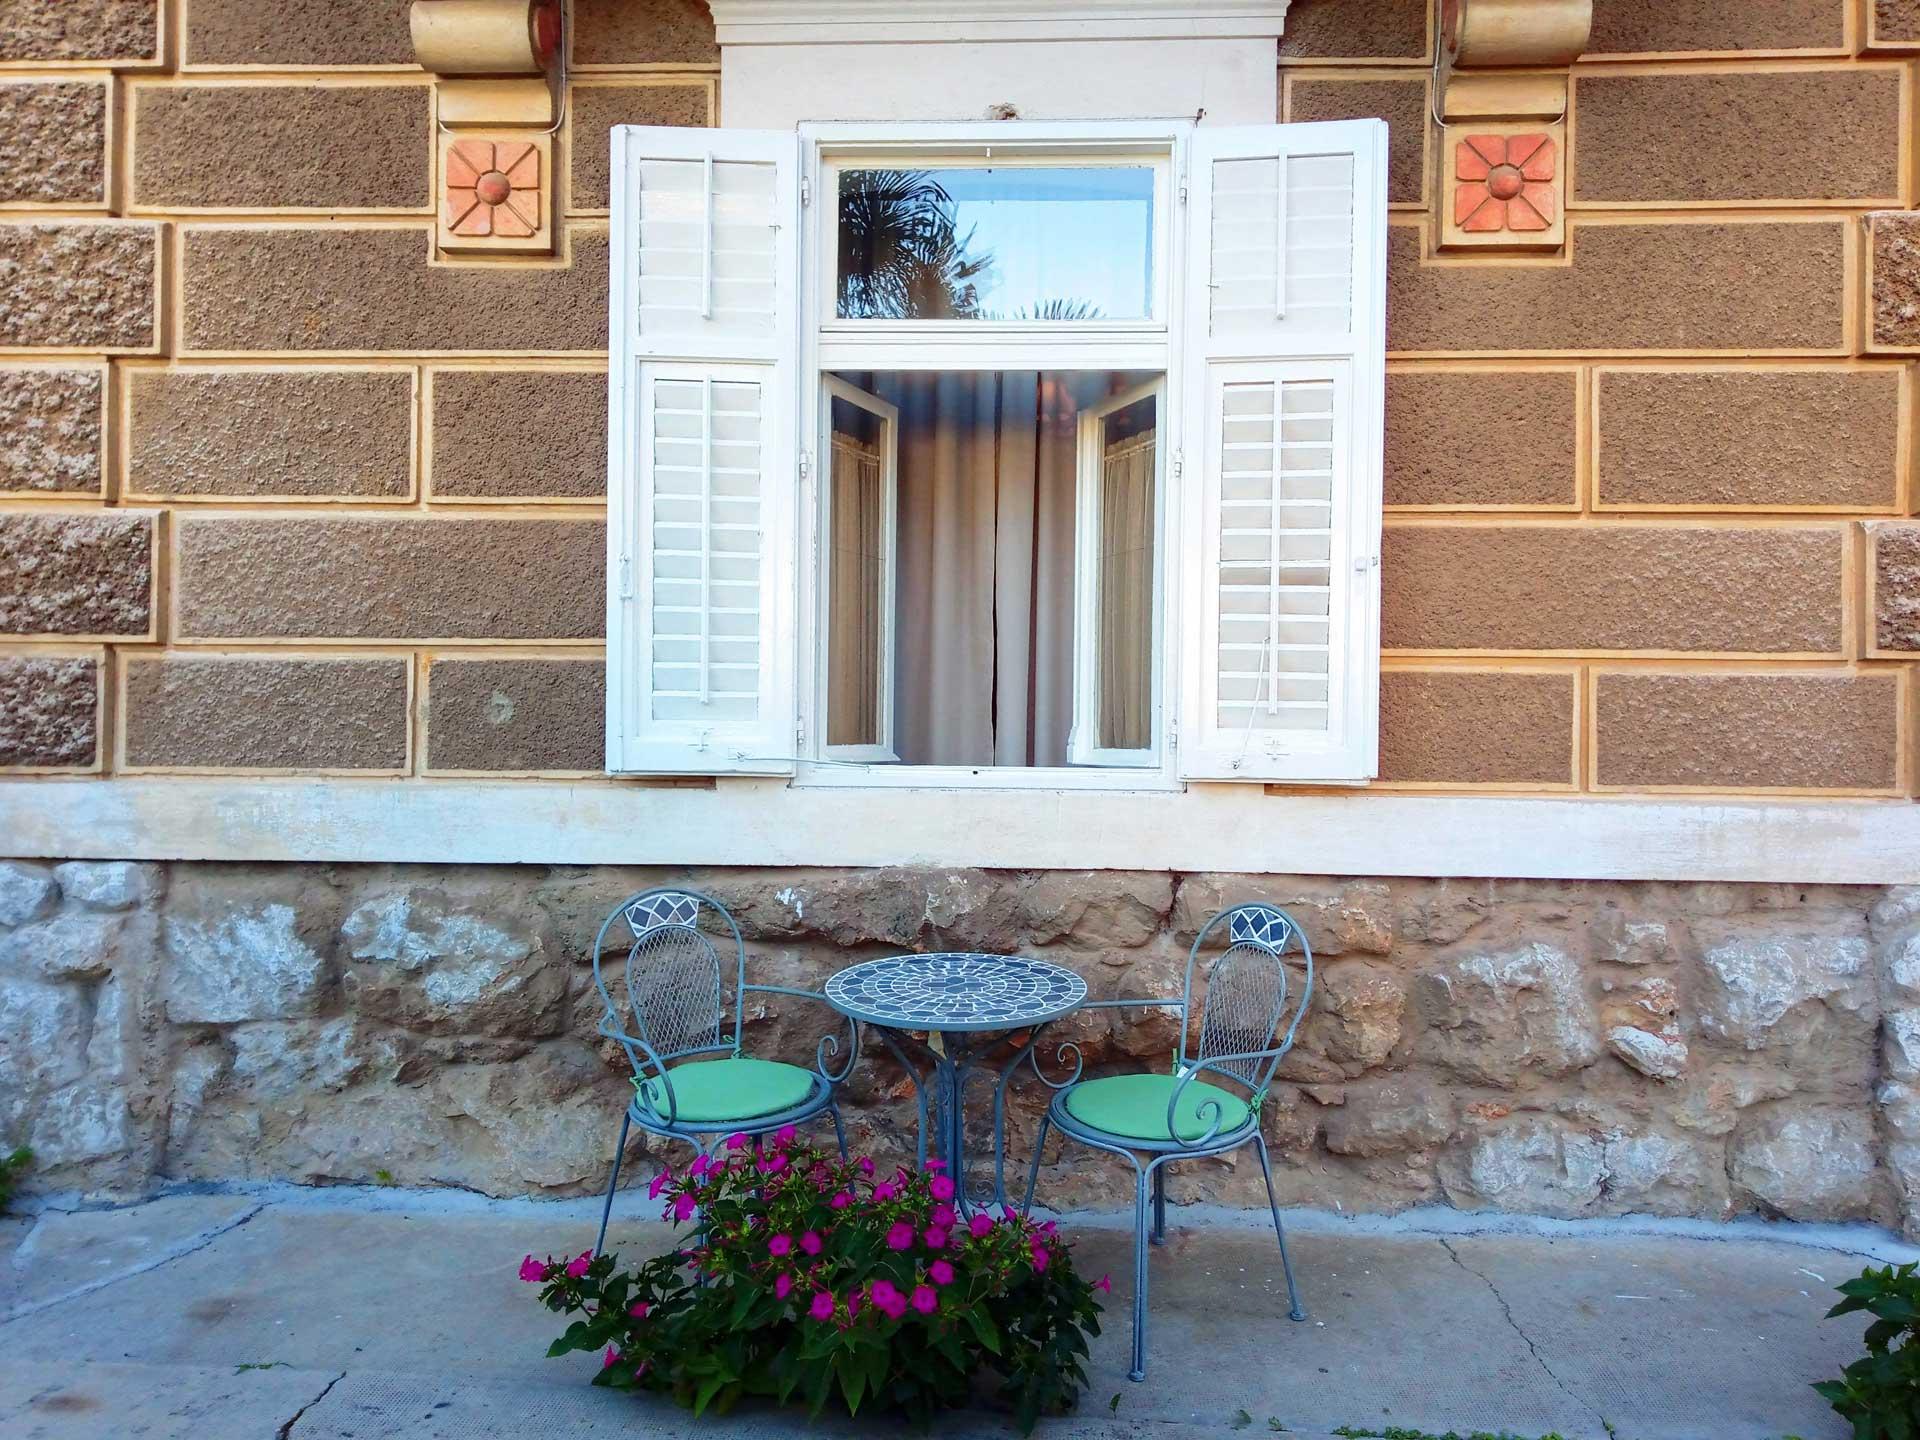 Villa San Giuseppe Lovran, apartment 2+1 terrace with flowers